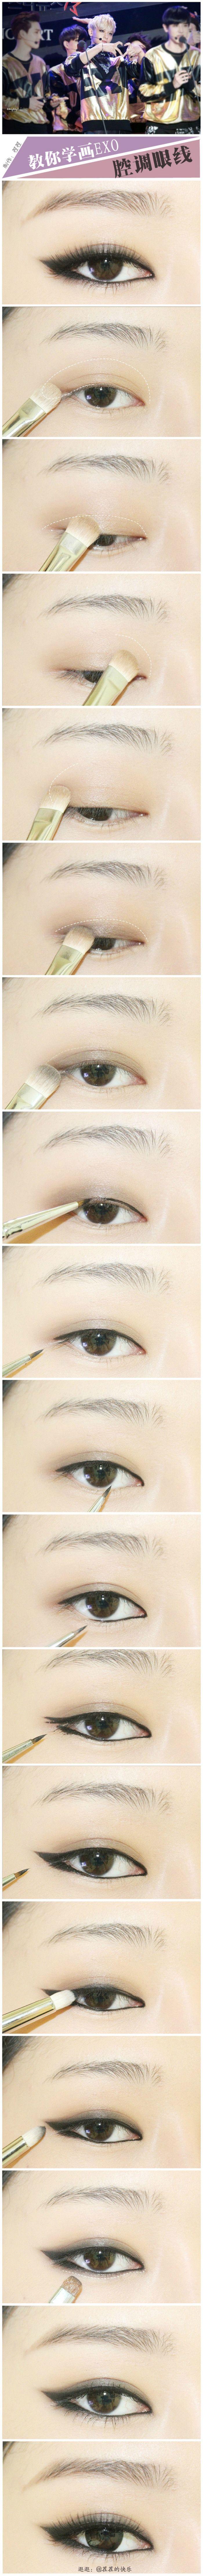 Tao eye make up